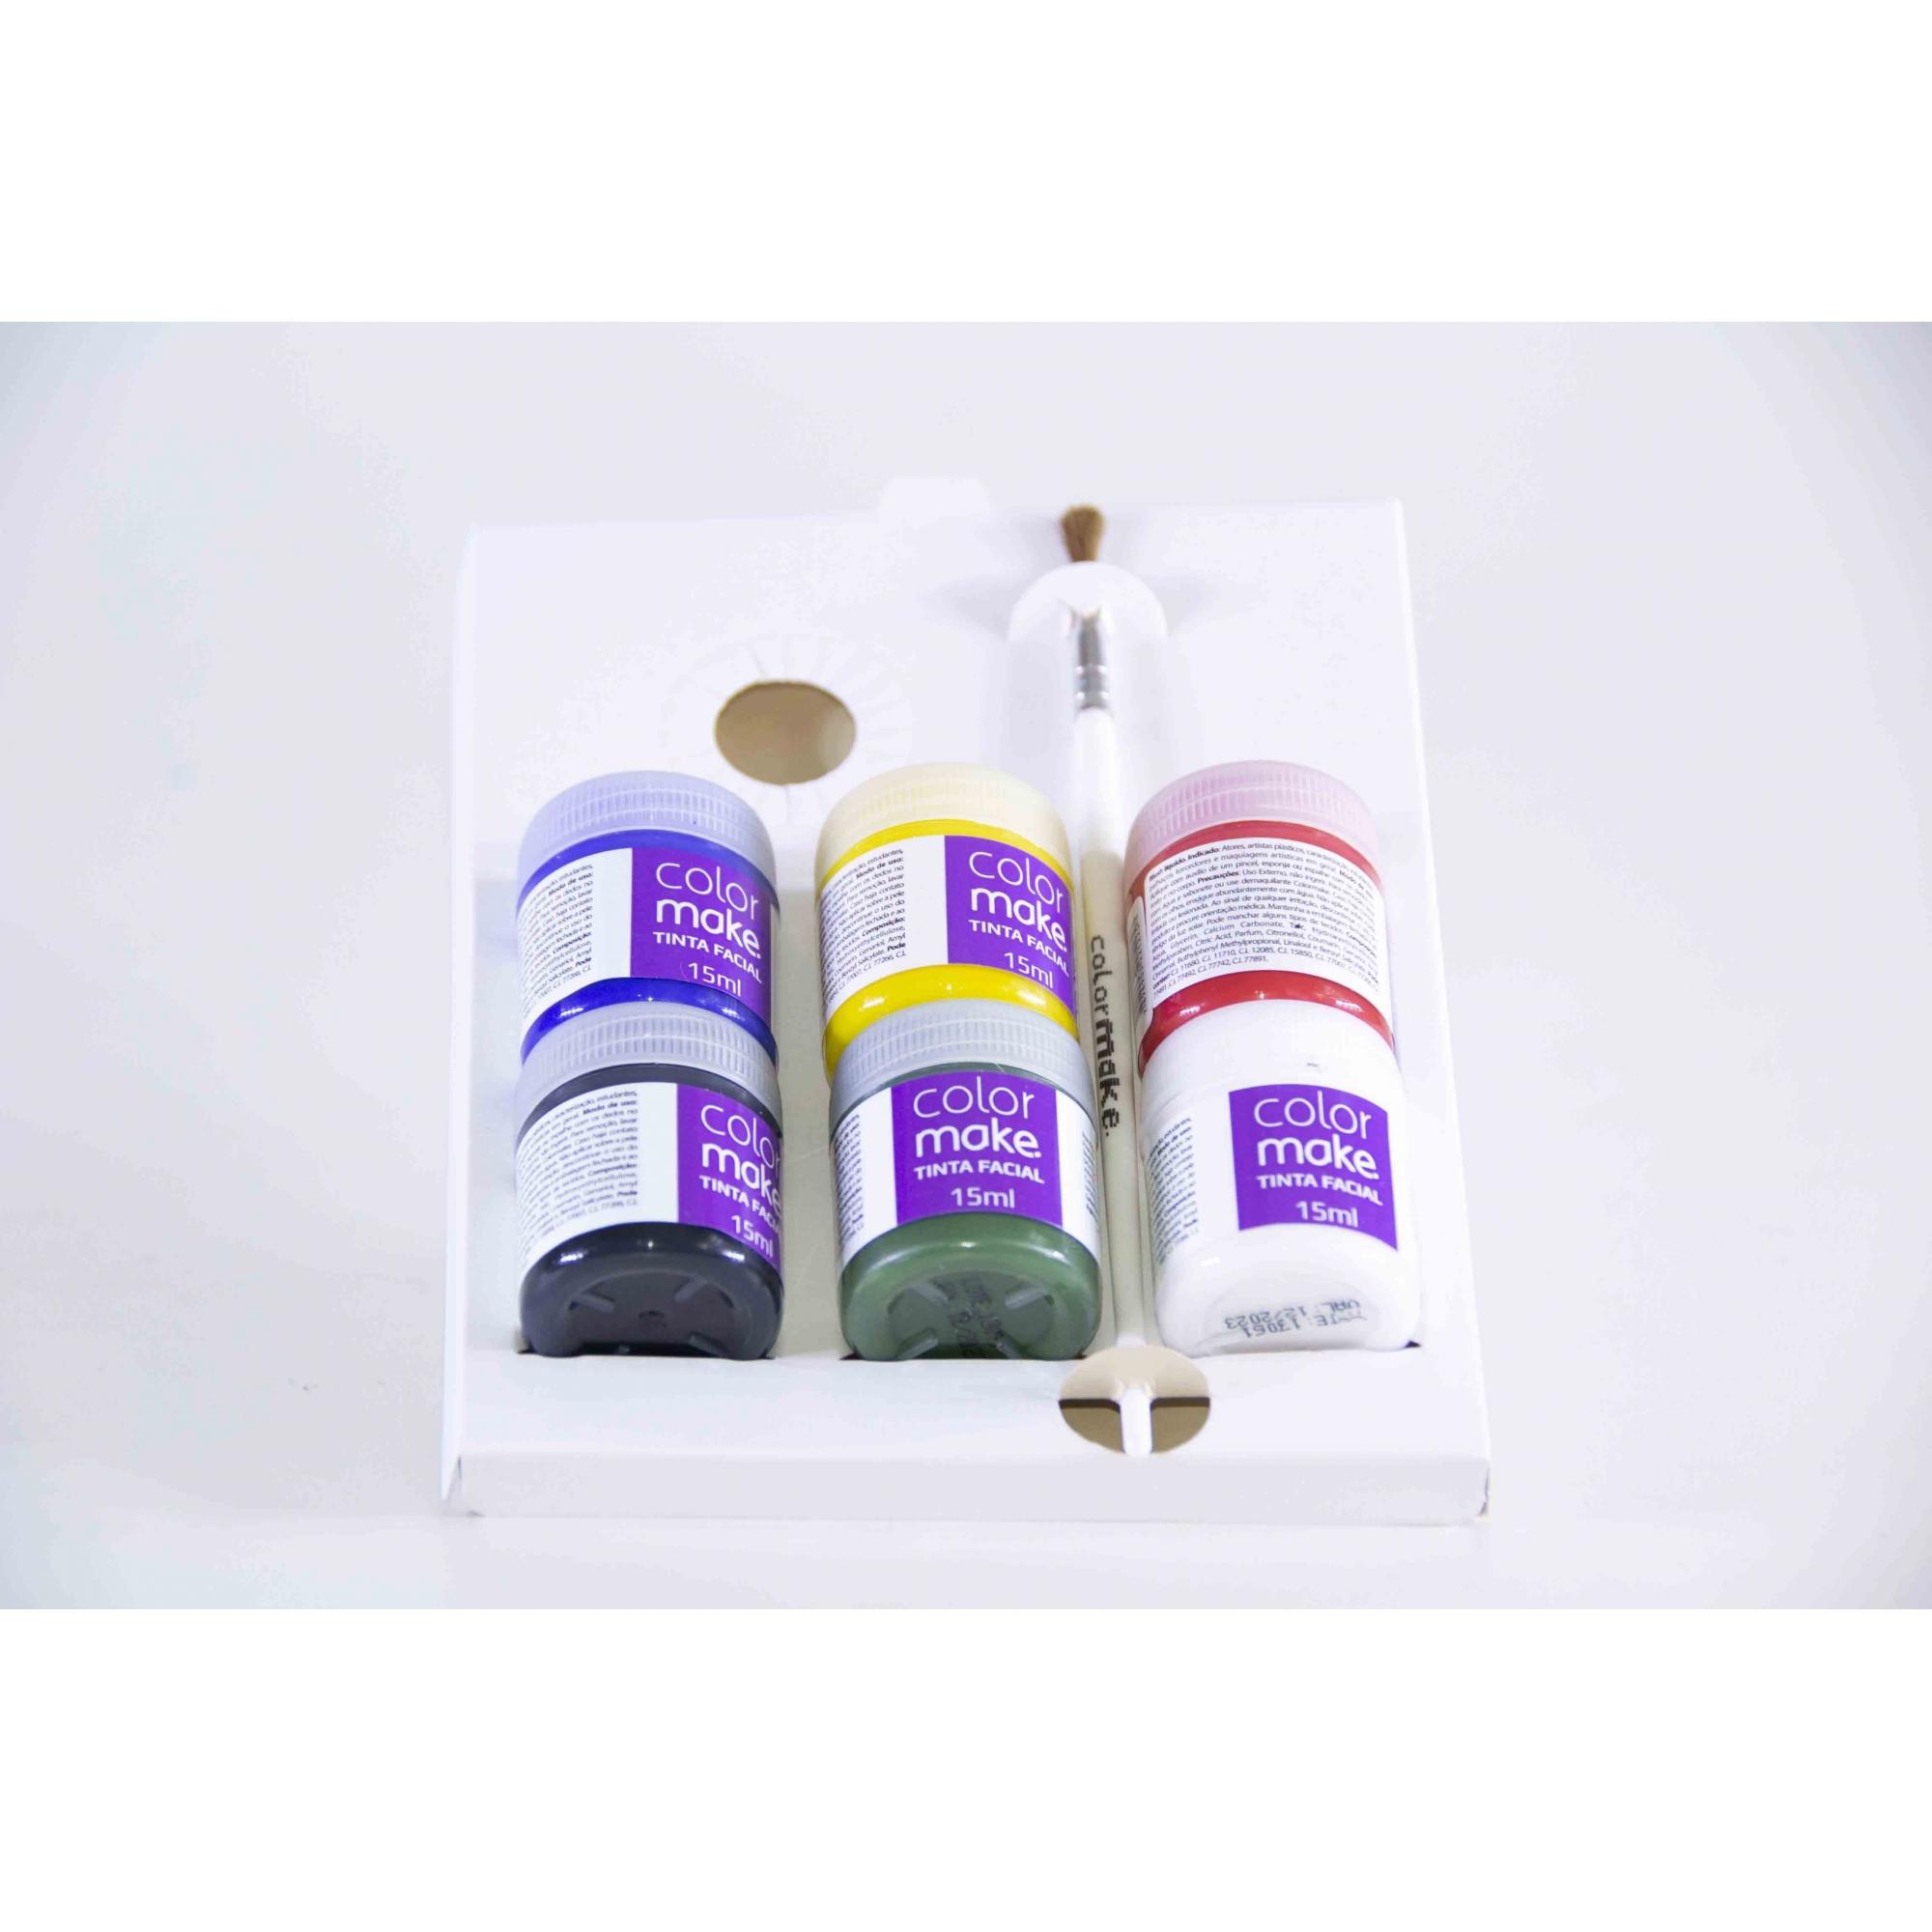 Tinta Líquida Facial Com Pincel 6 Cores (15Ml Cada) - Color Make